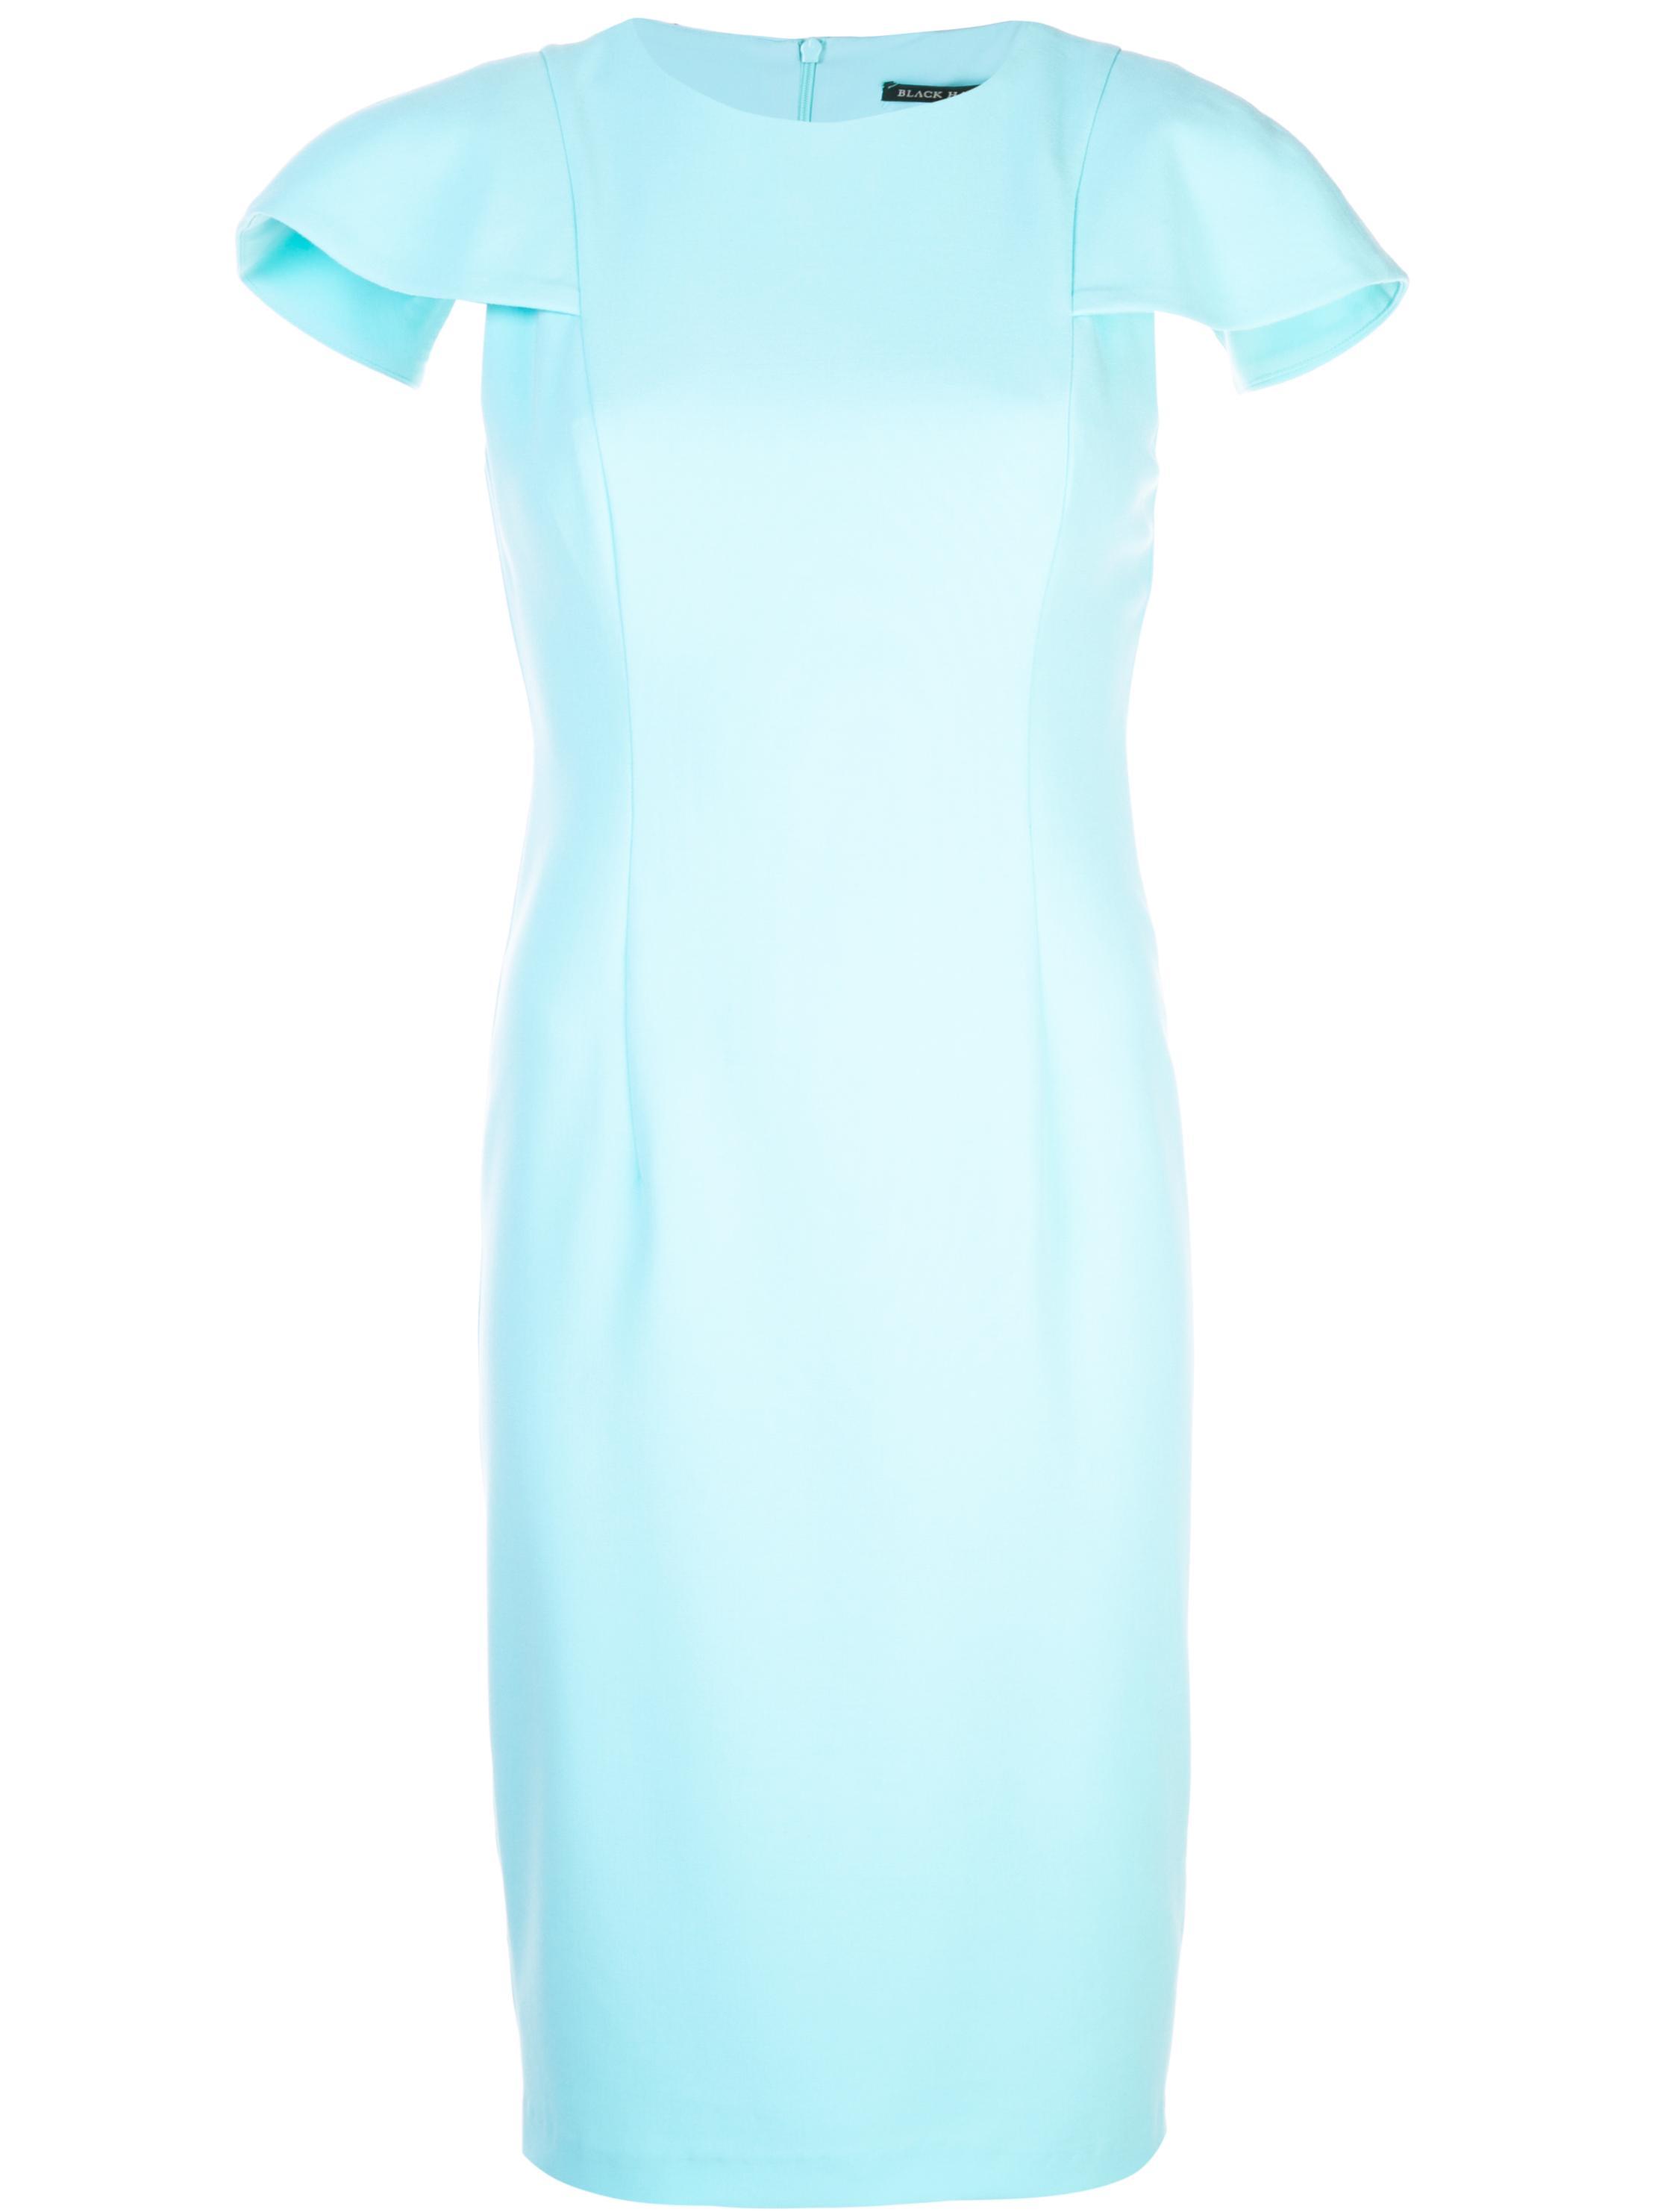 Desta Cap Sleeve Sheath Dress Item # 3599628-S19